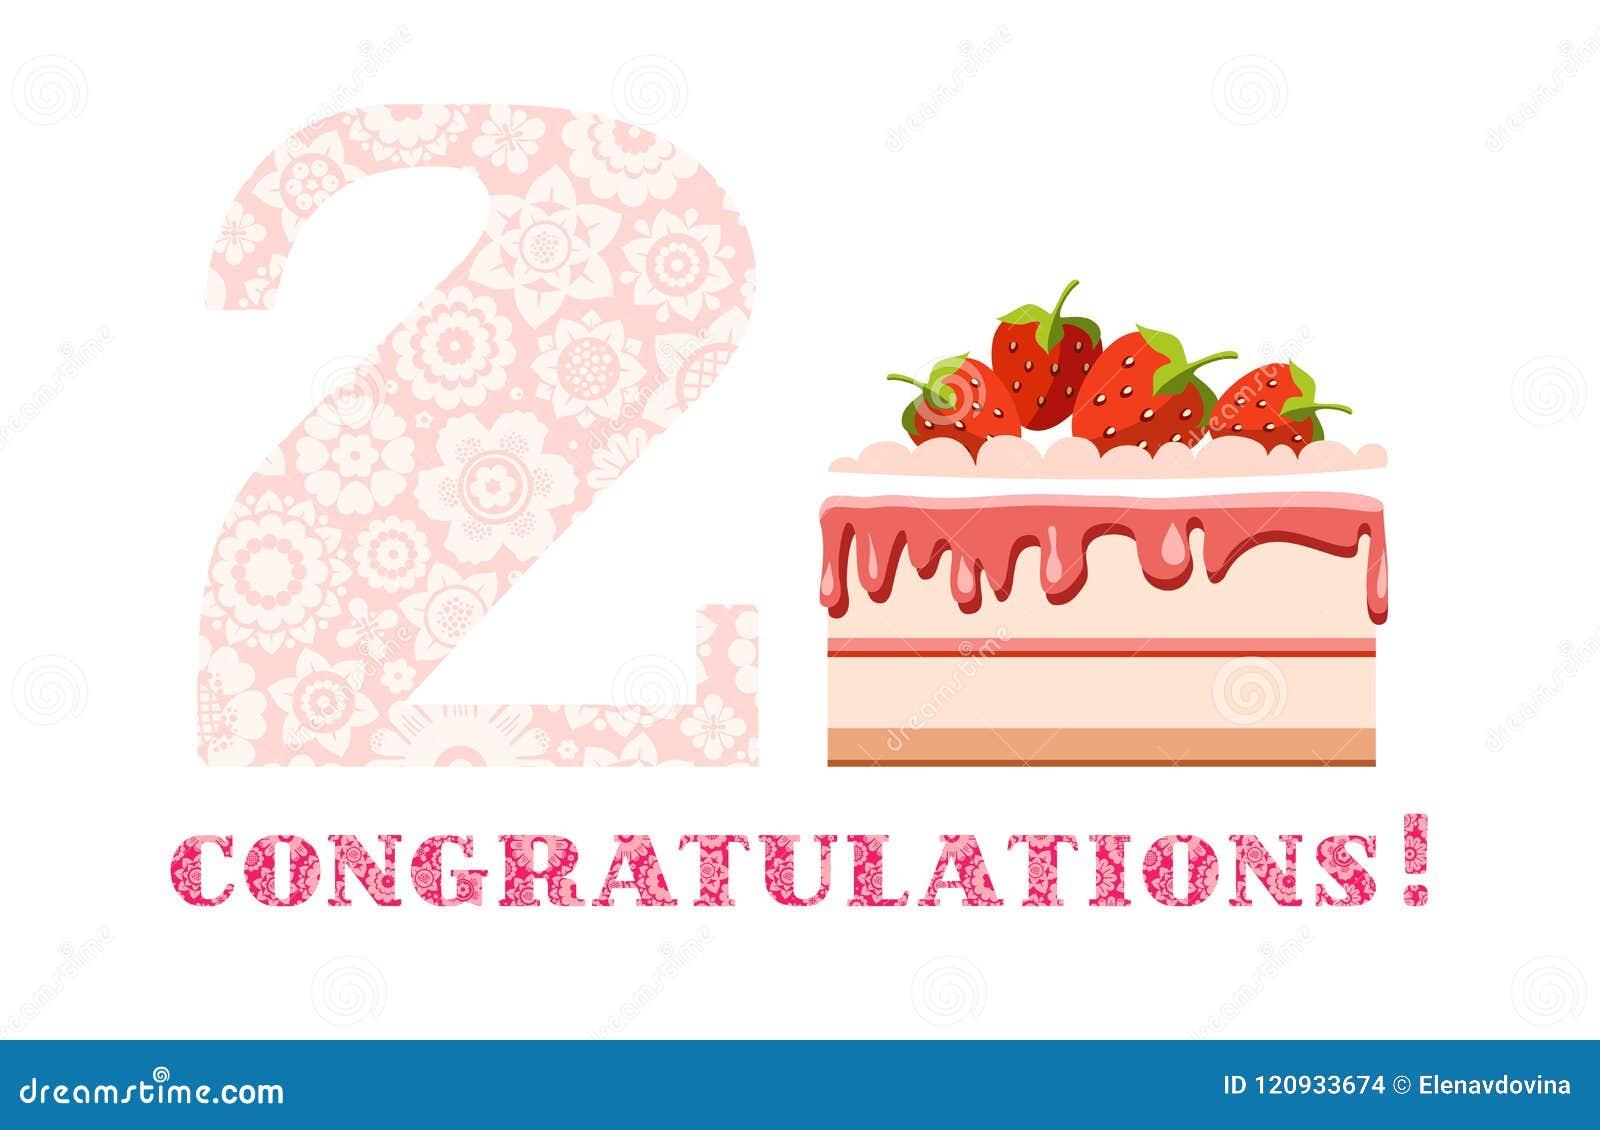 Congratulations 2 Years Strawberry Cake English White Pink